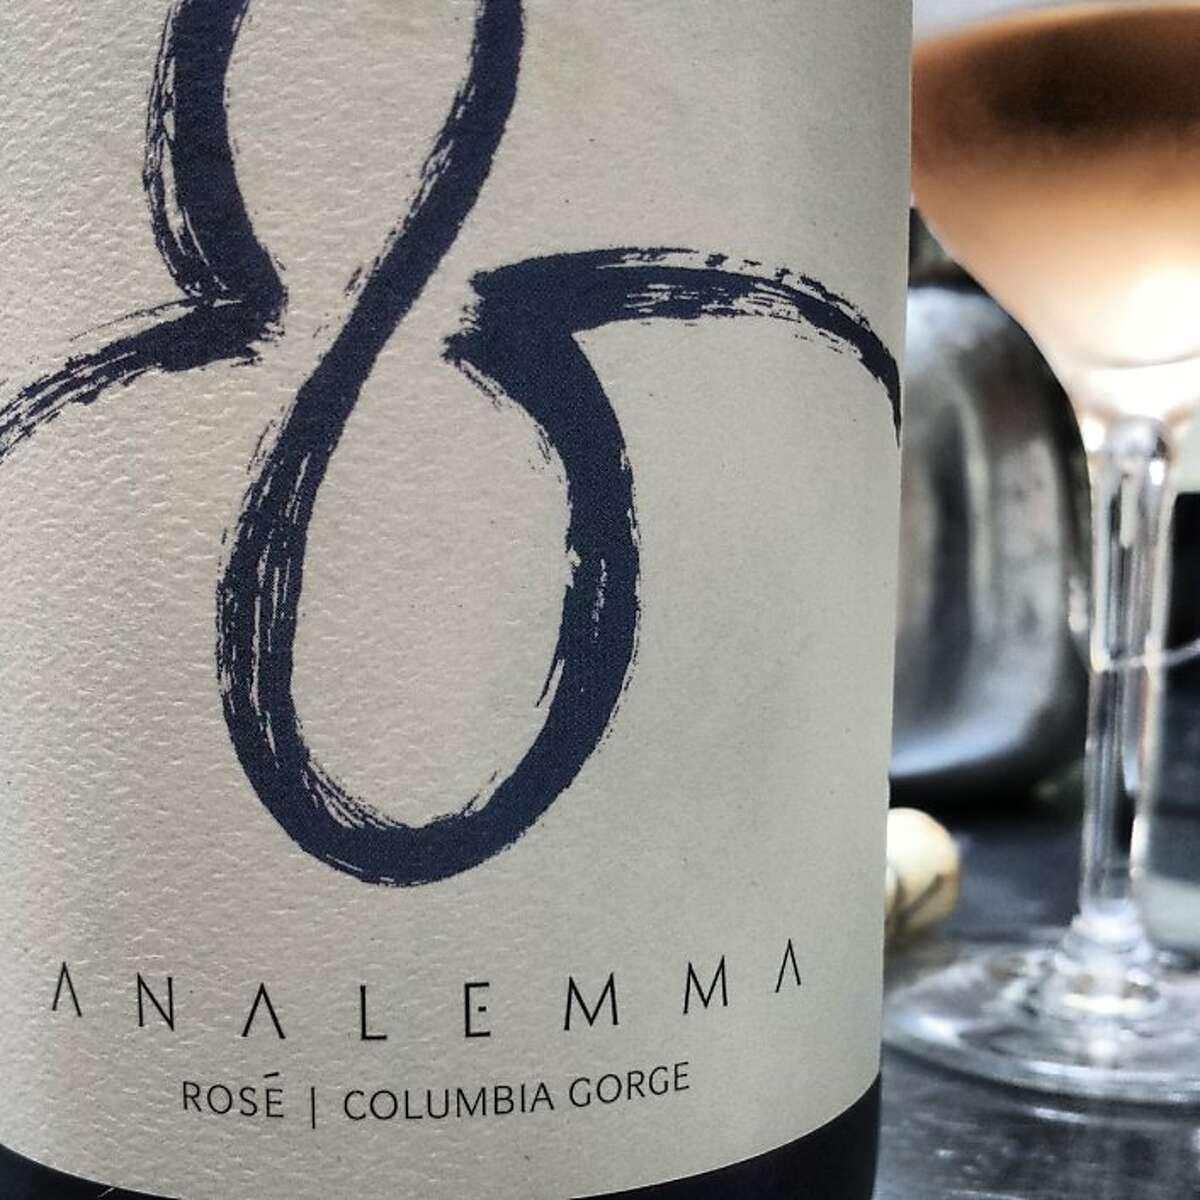 A bottle of Analemma Rose, one of the bottles for Jon Bonne's Top 10 of 2013.